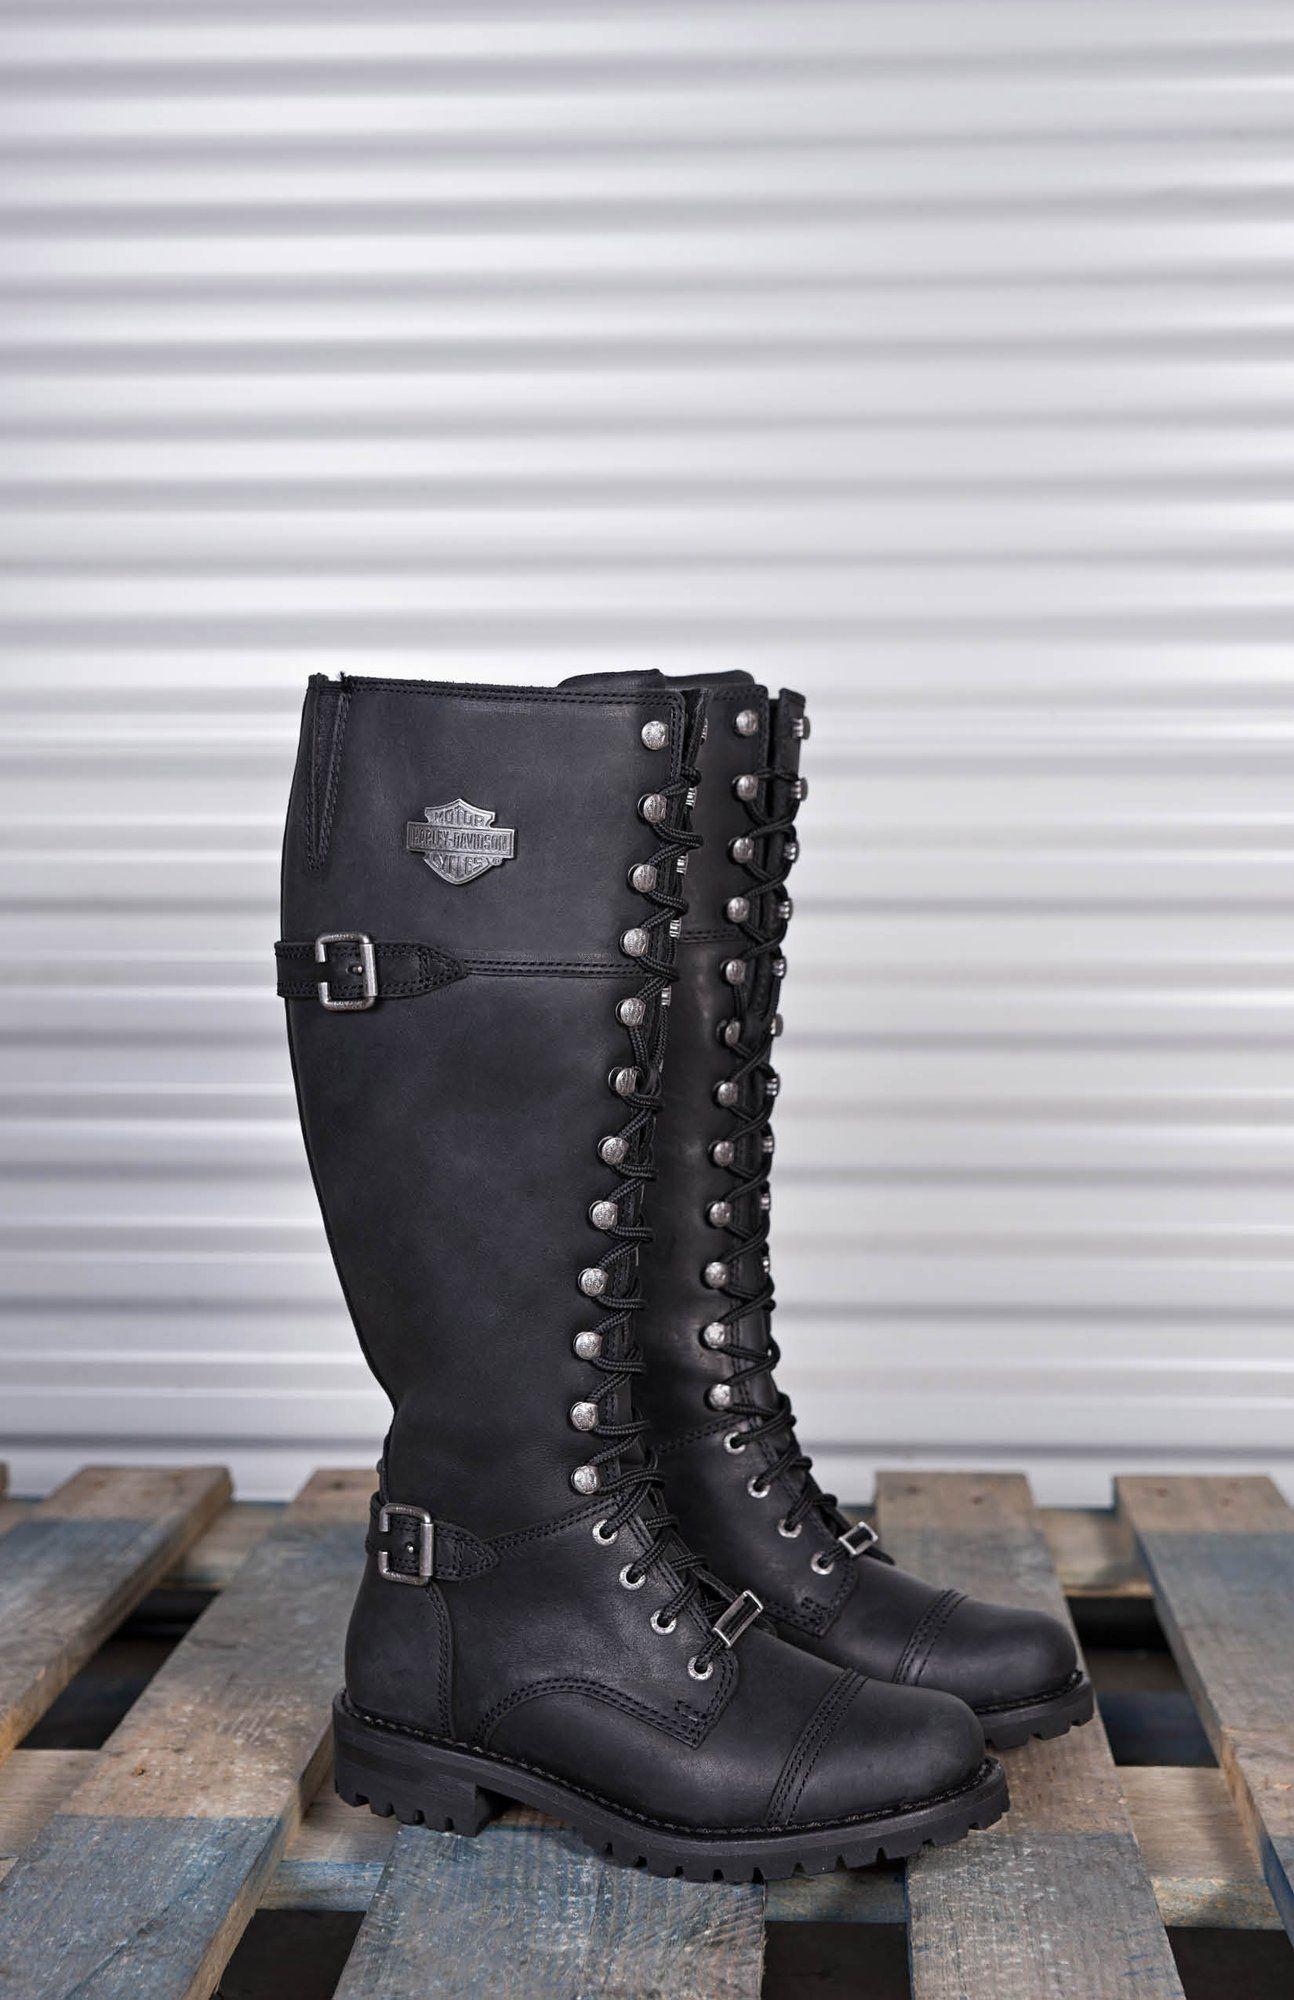 HARLEY DAVIDSON Women Boots ADRIAN black